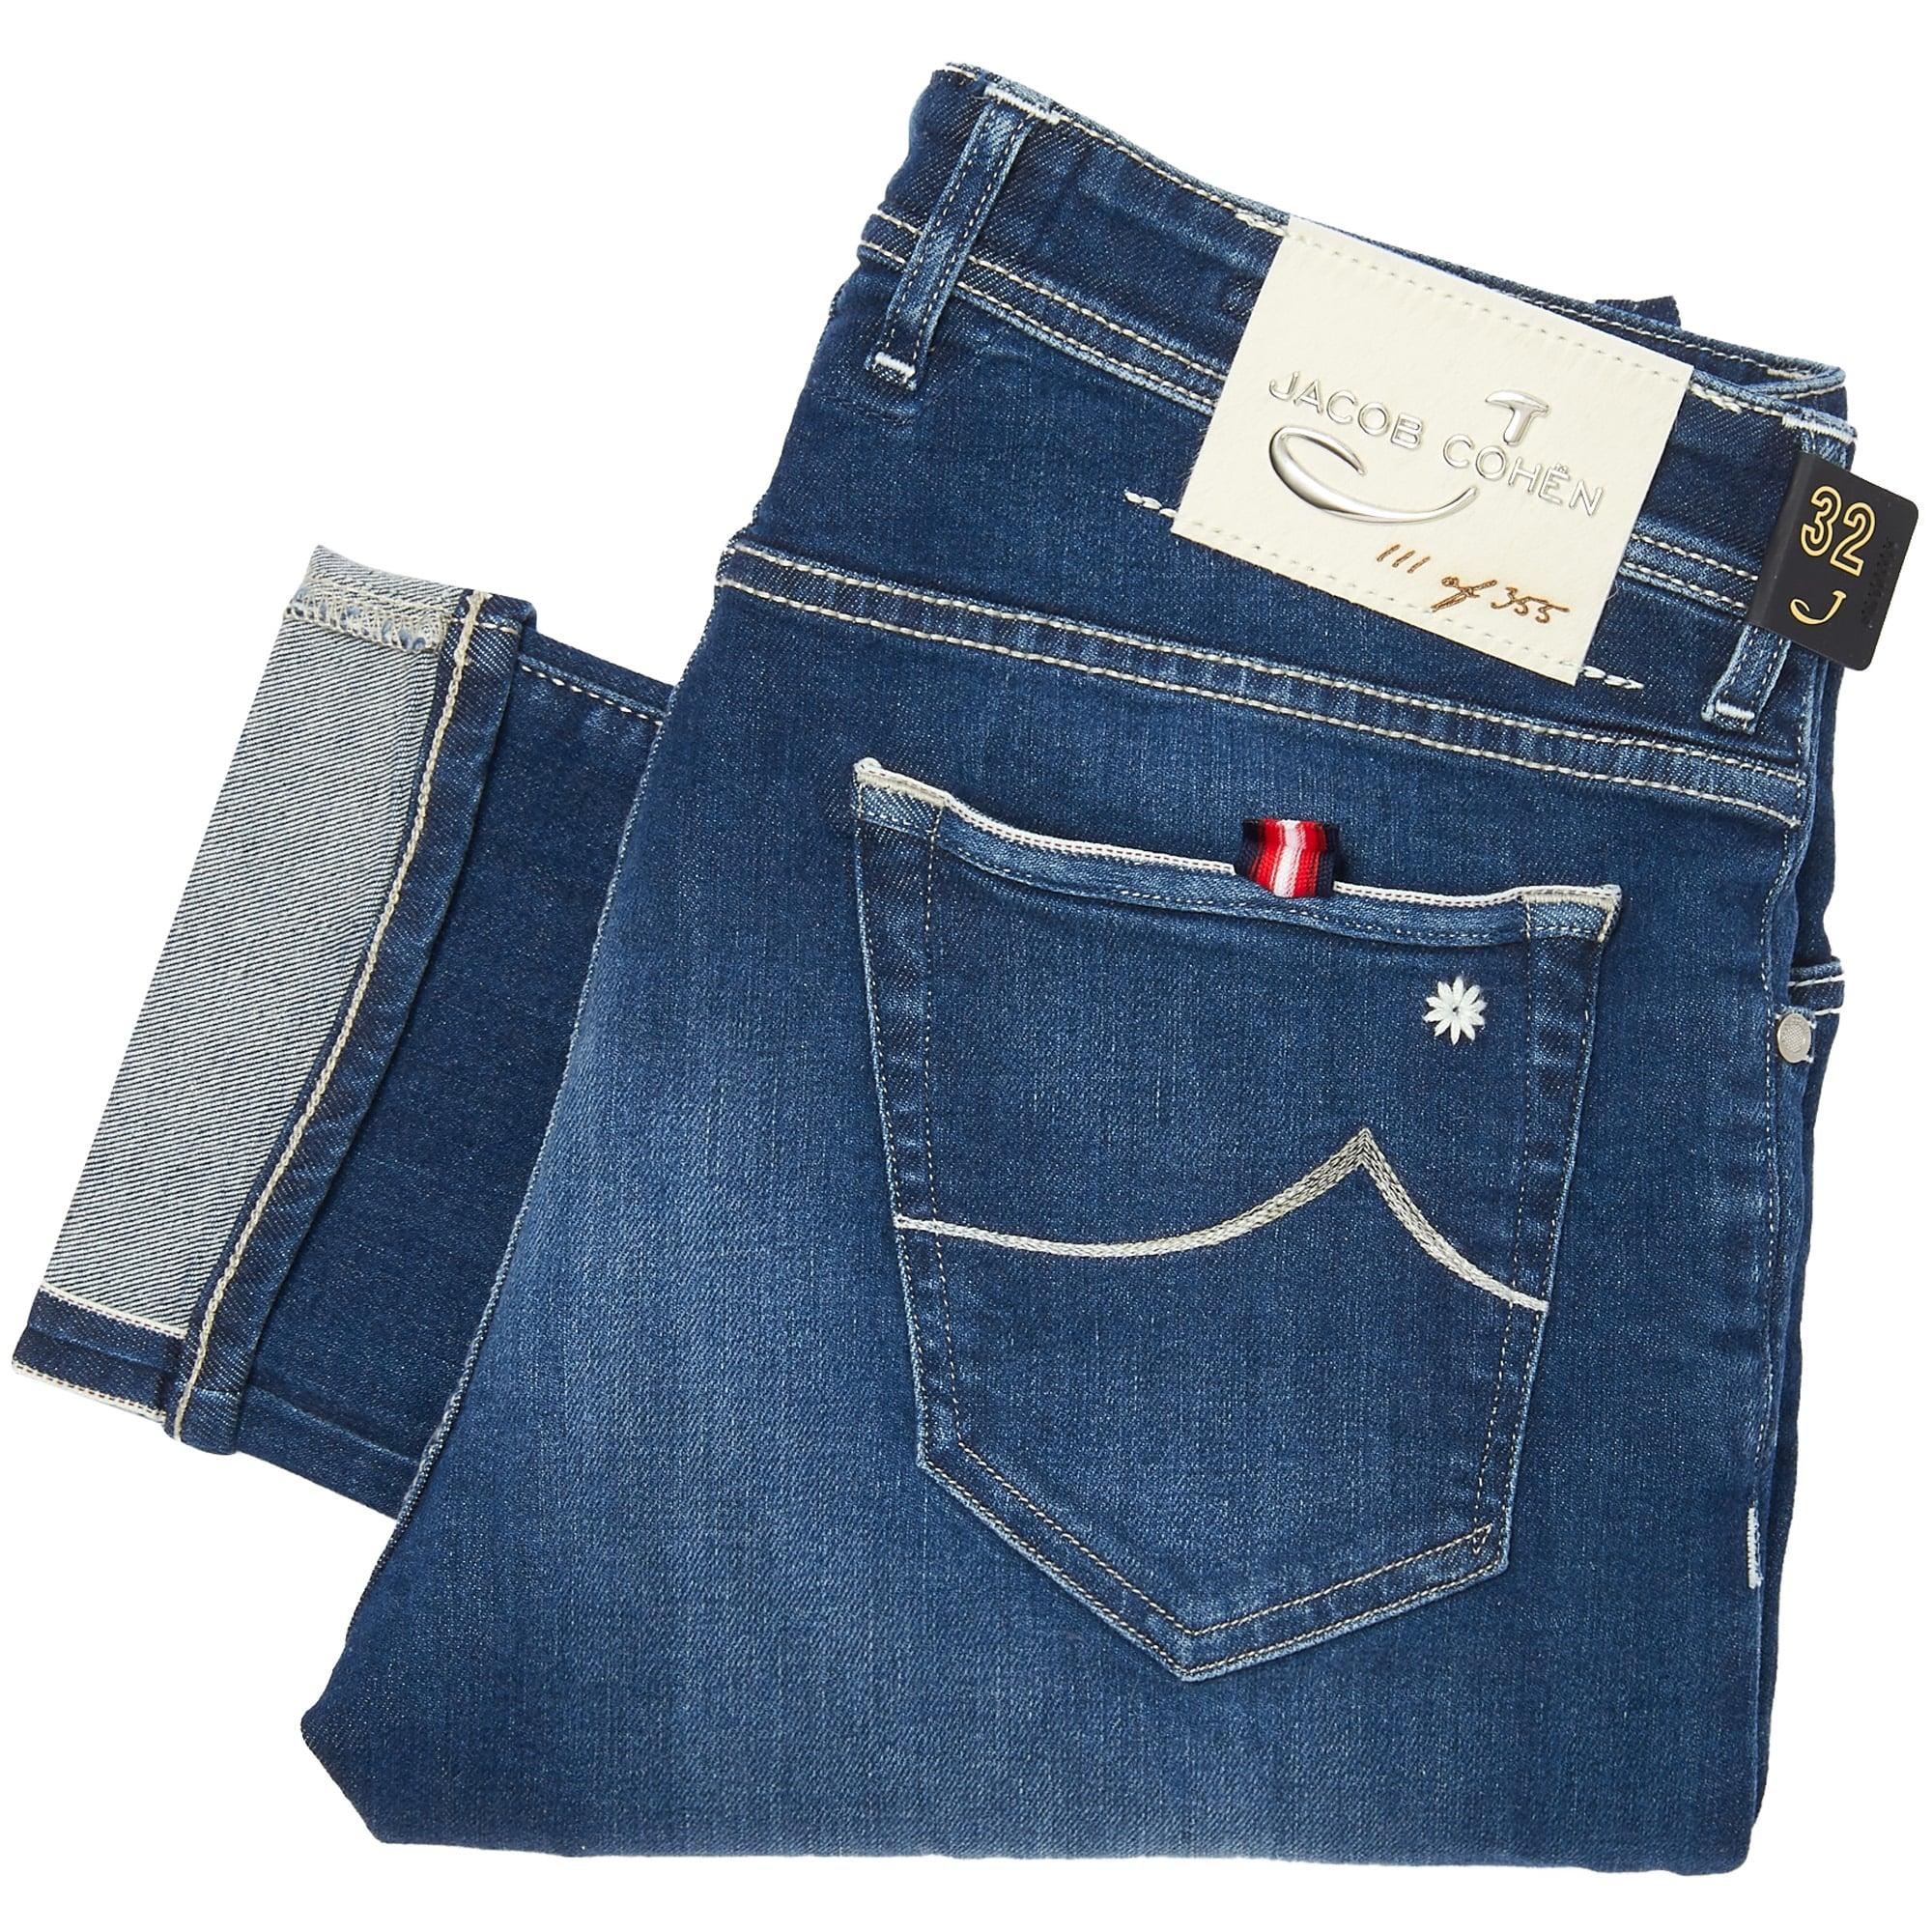 Rag bones jeans